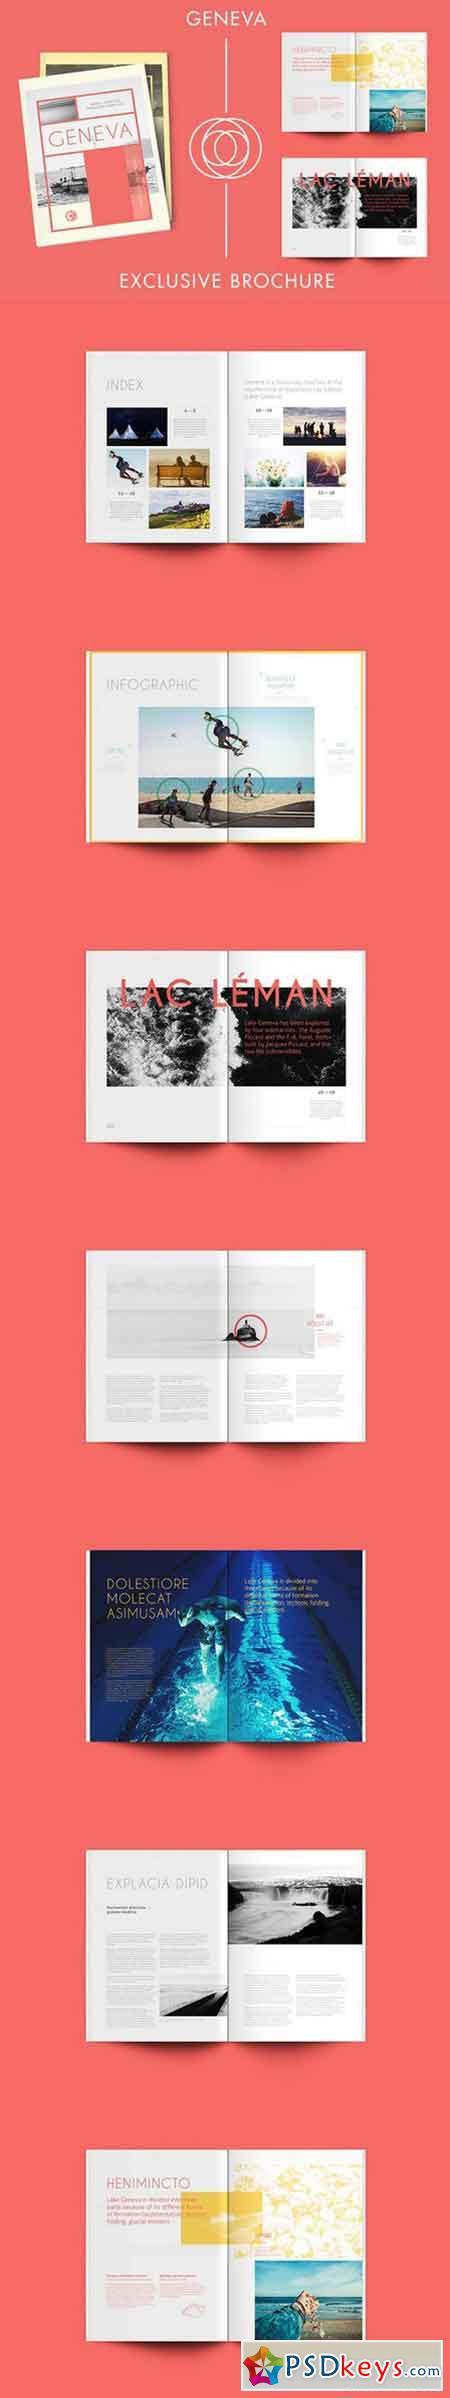 Geneva Brochure 866270